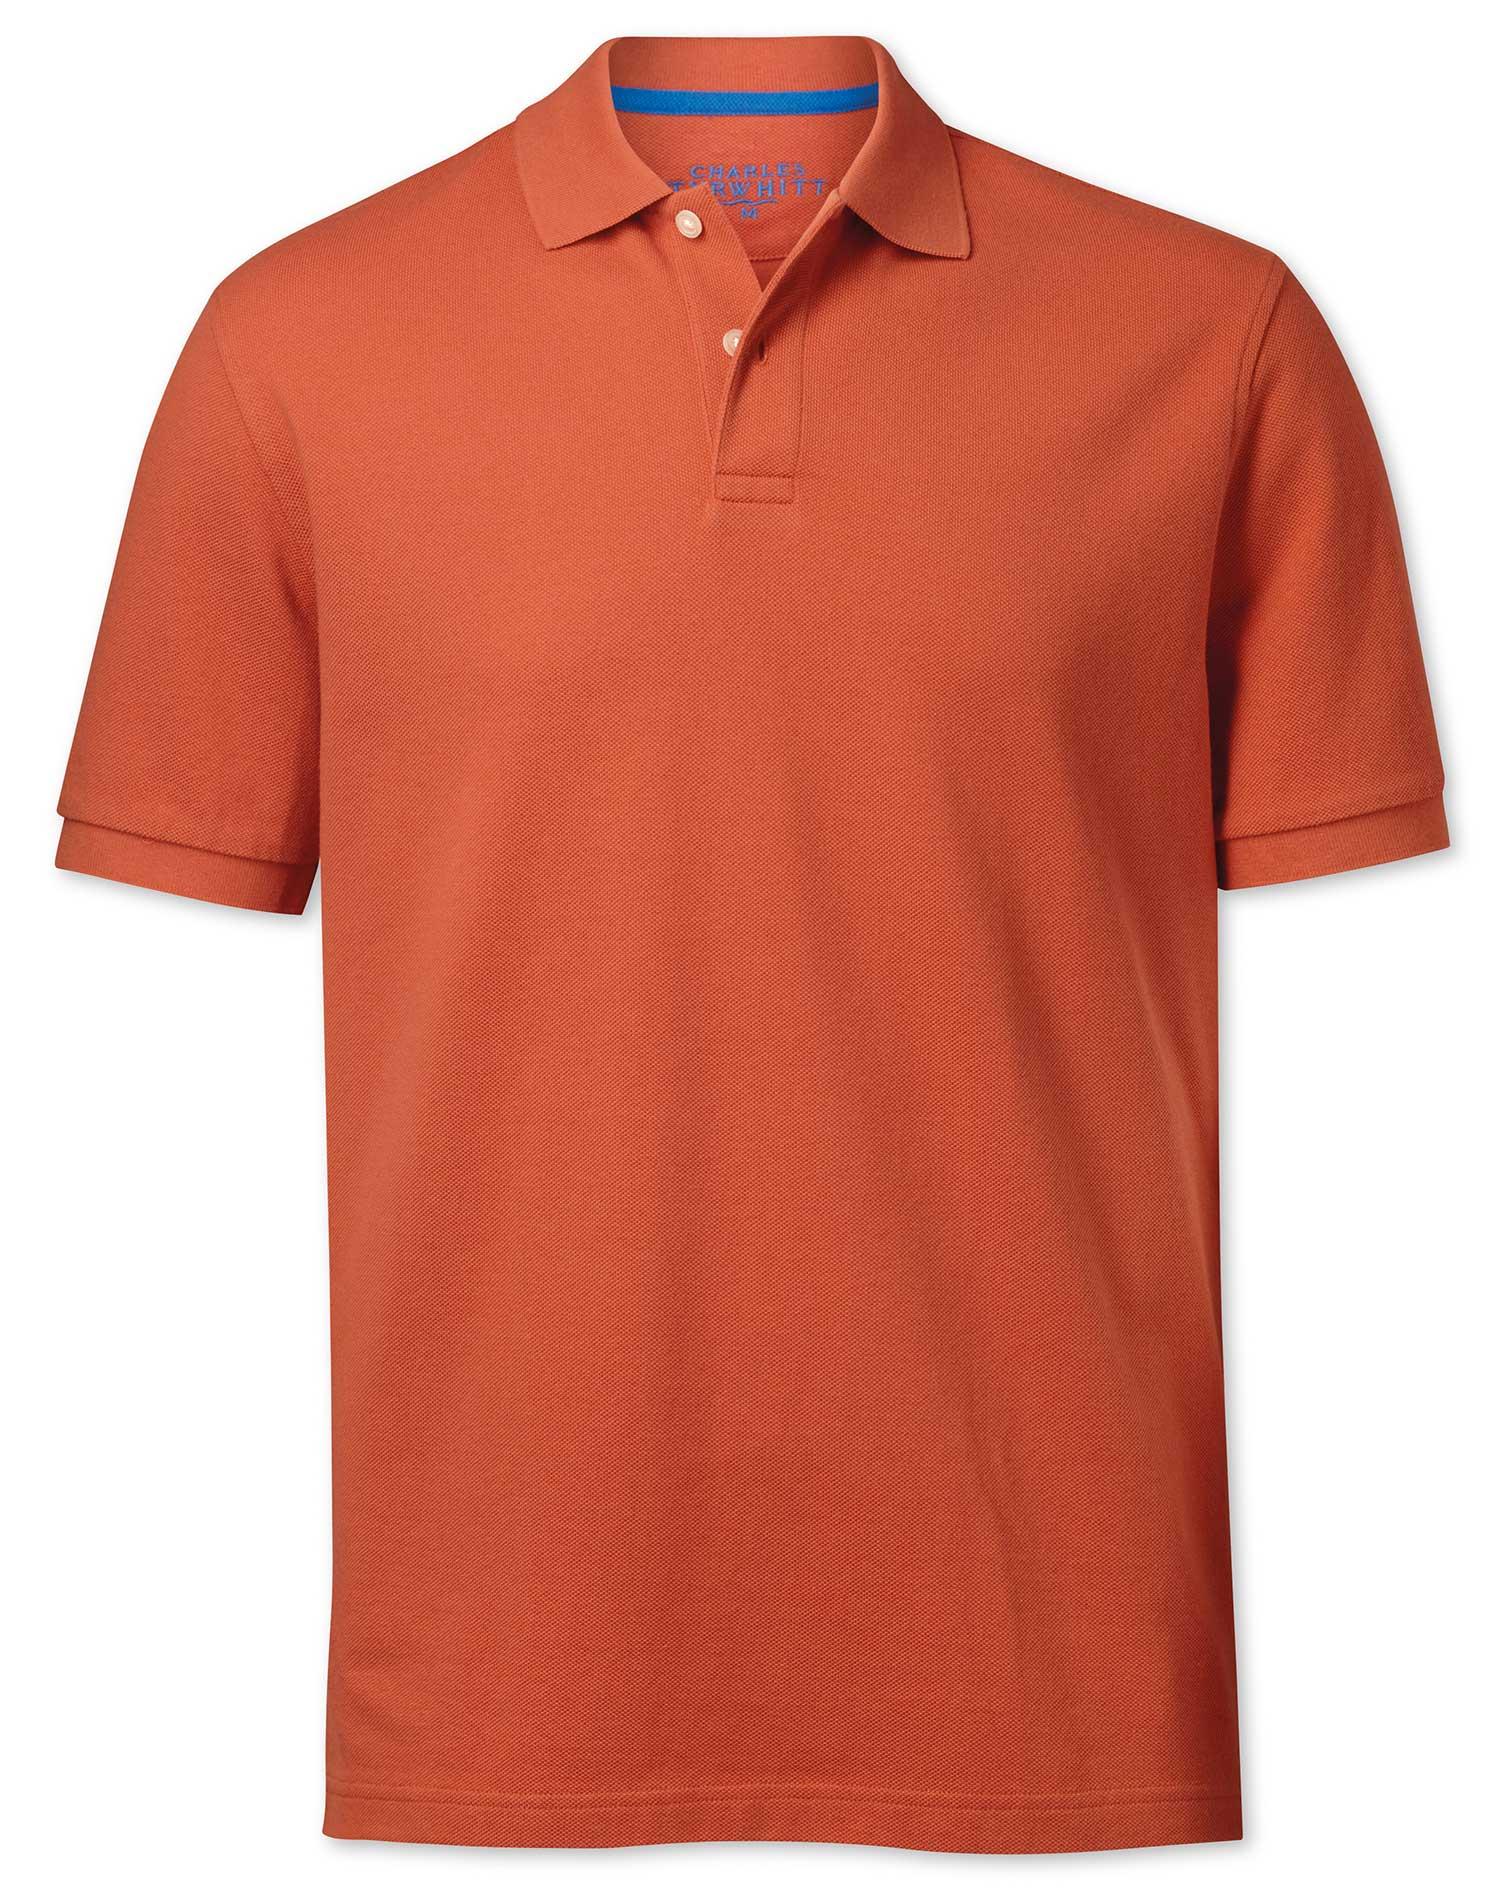 Dark Orange Pique Cotton Polo Size Small by Charles Tyrwhitt